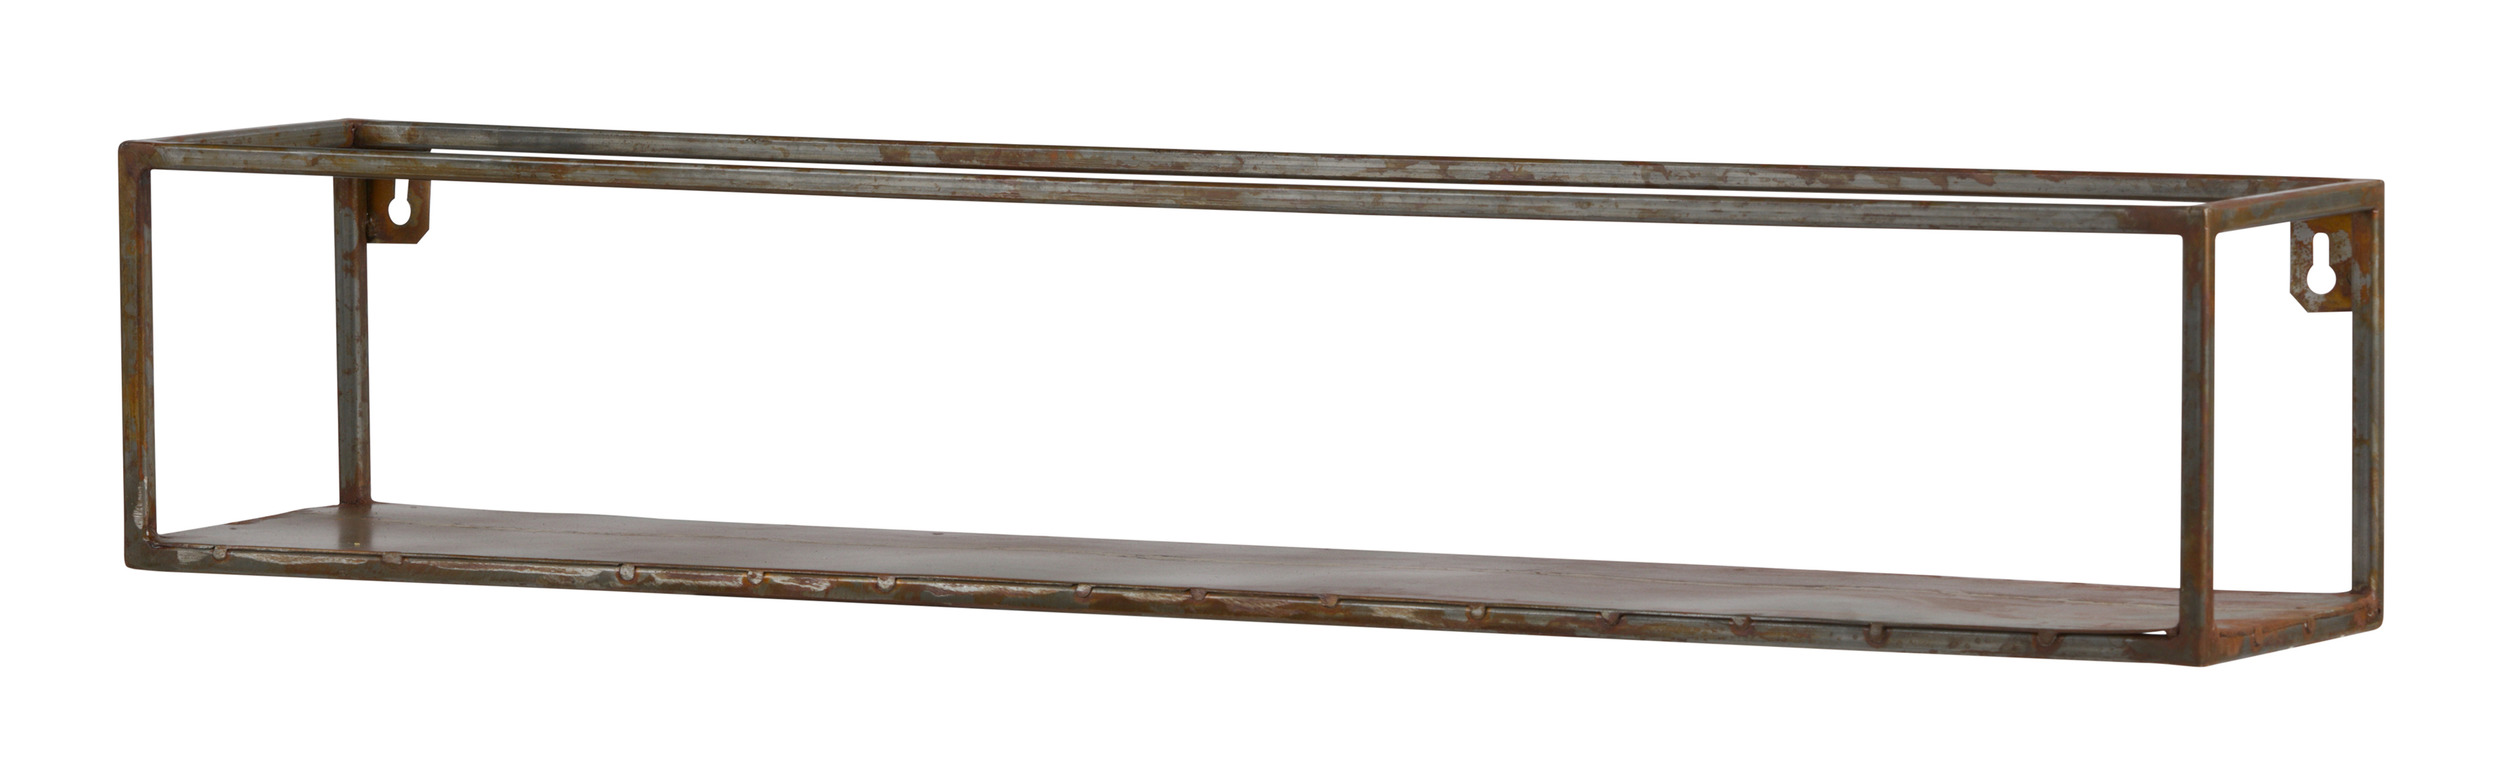 BePureHome Wandrek 'Welldone' 80cm, kleur Roest korting